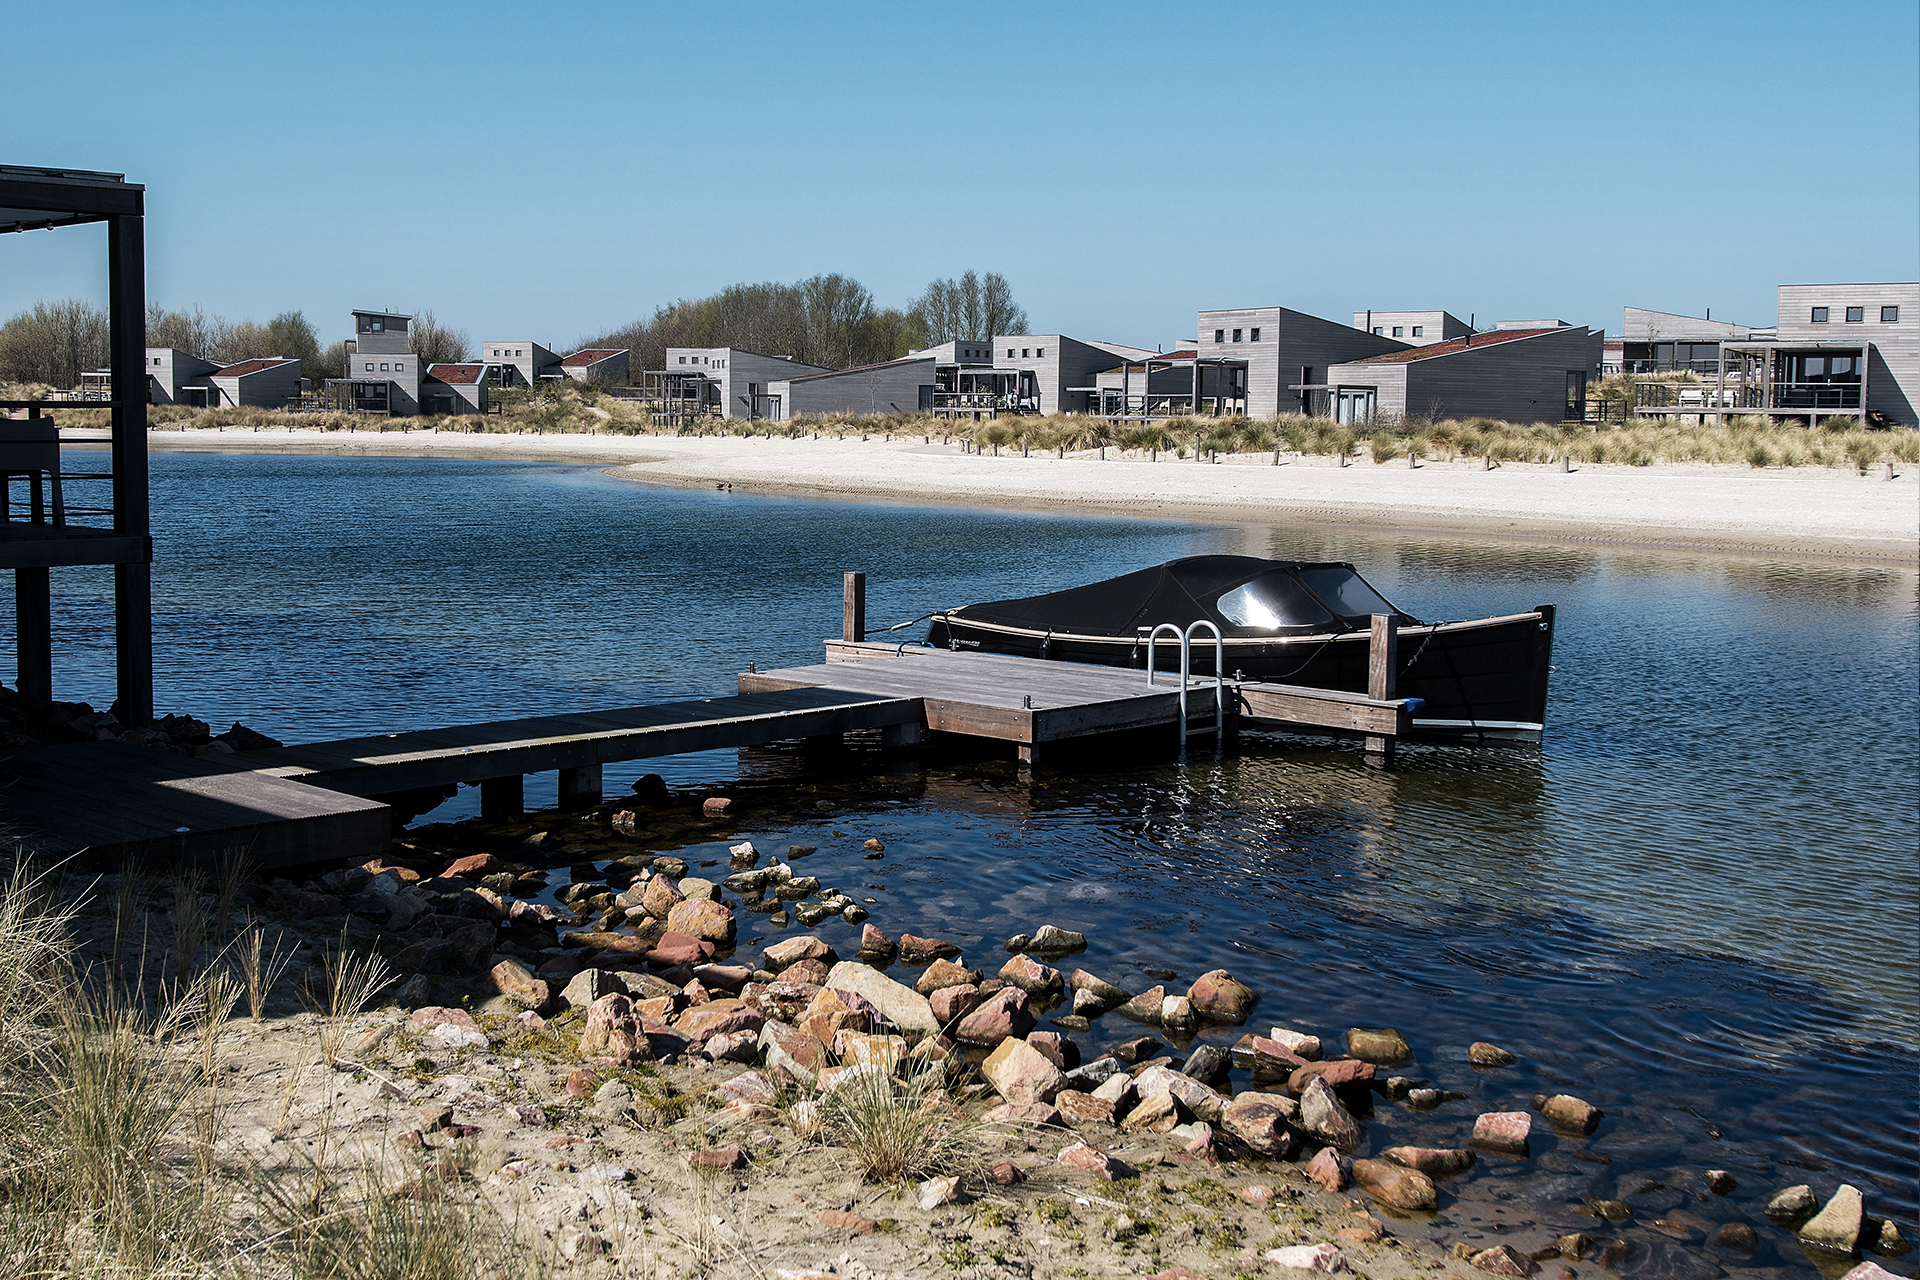 Punt West Hotel & Beach Resort (Brouwersdam) - Boot aan steiger